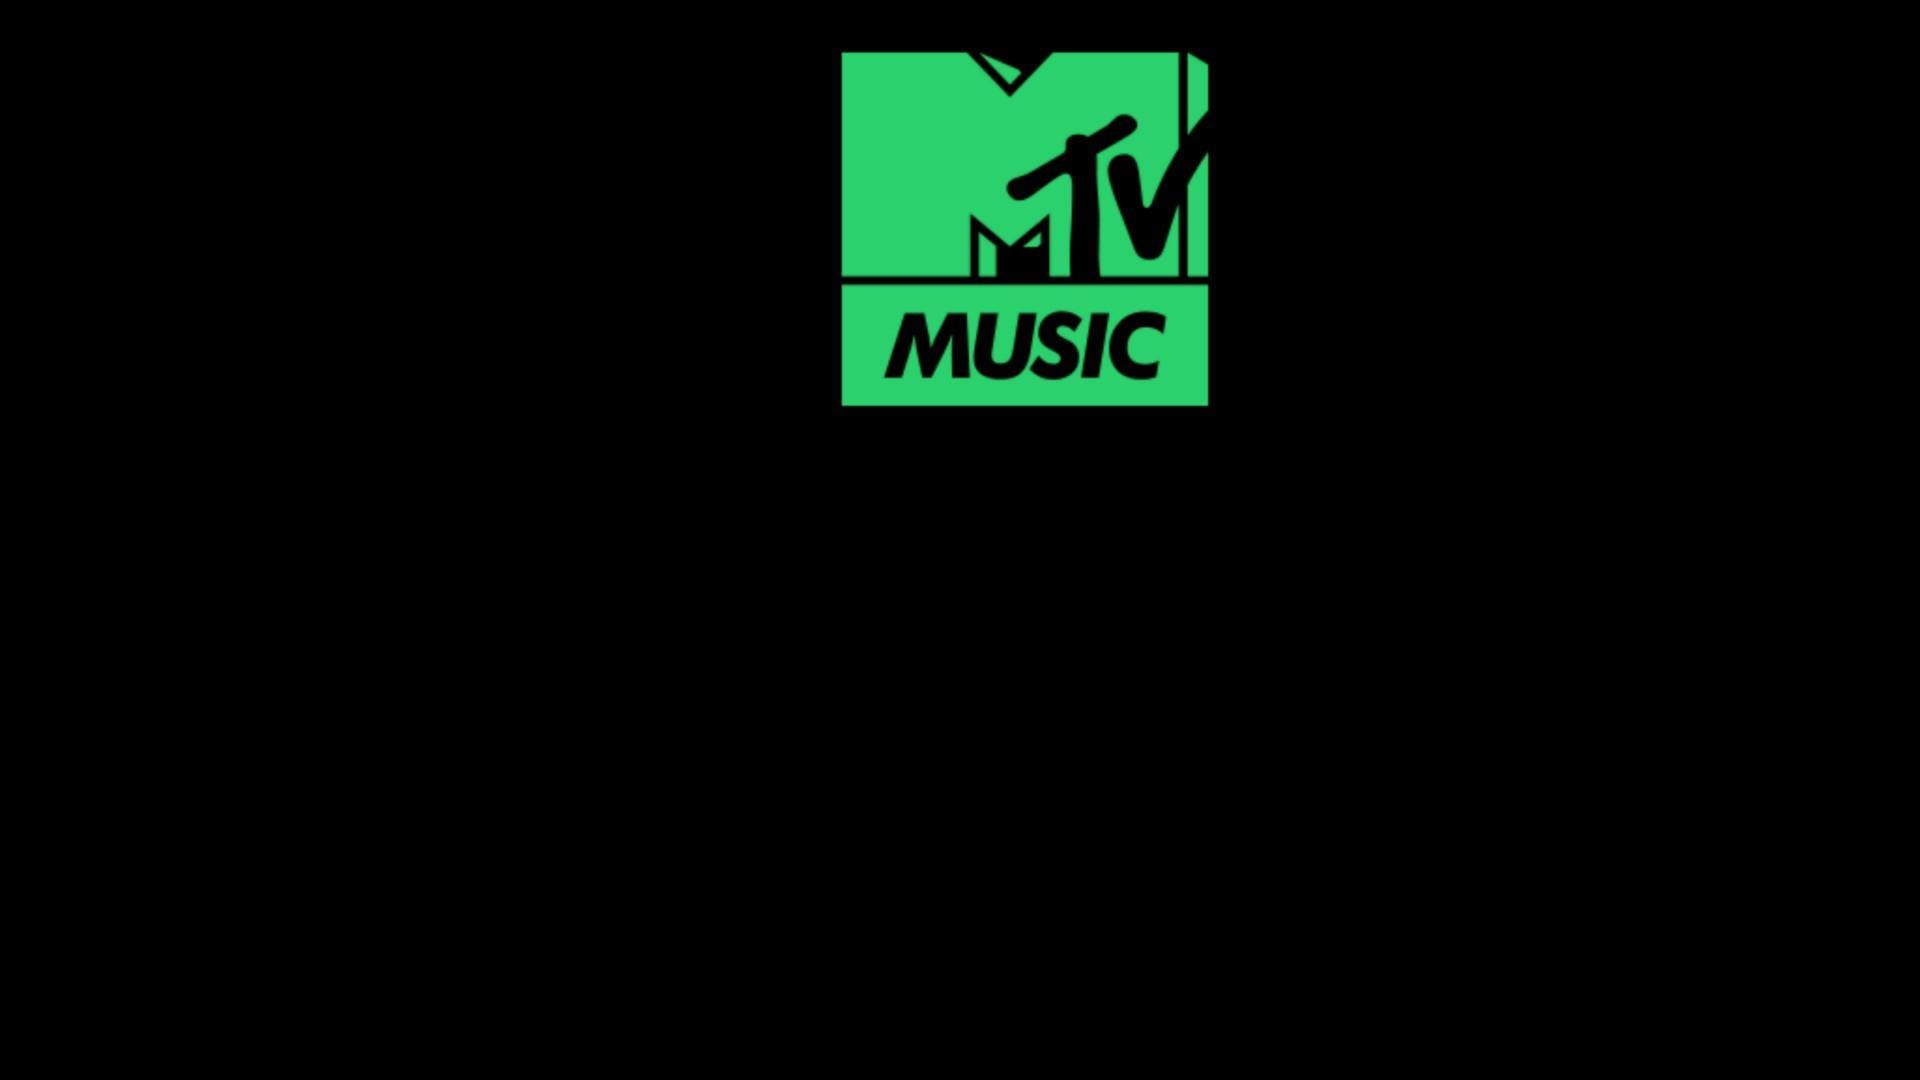 MTV Music 100% Music